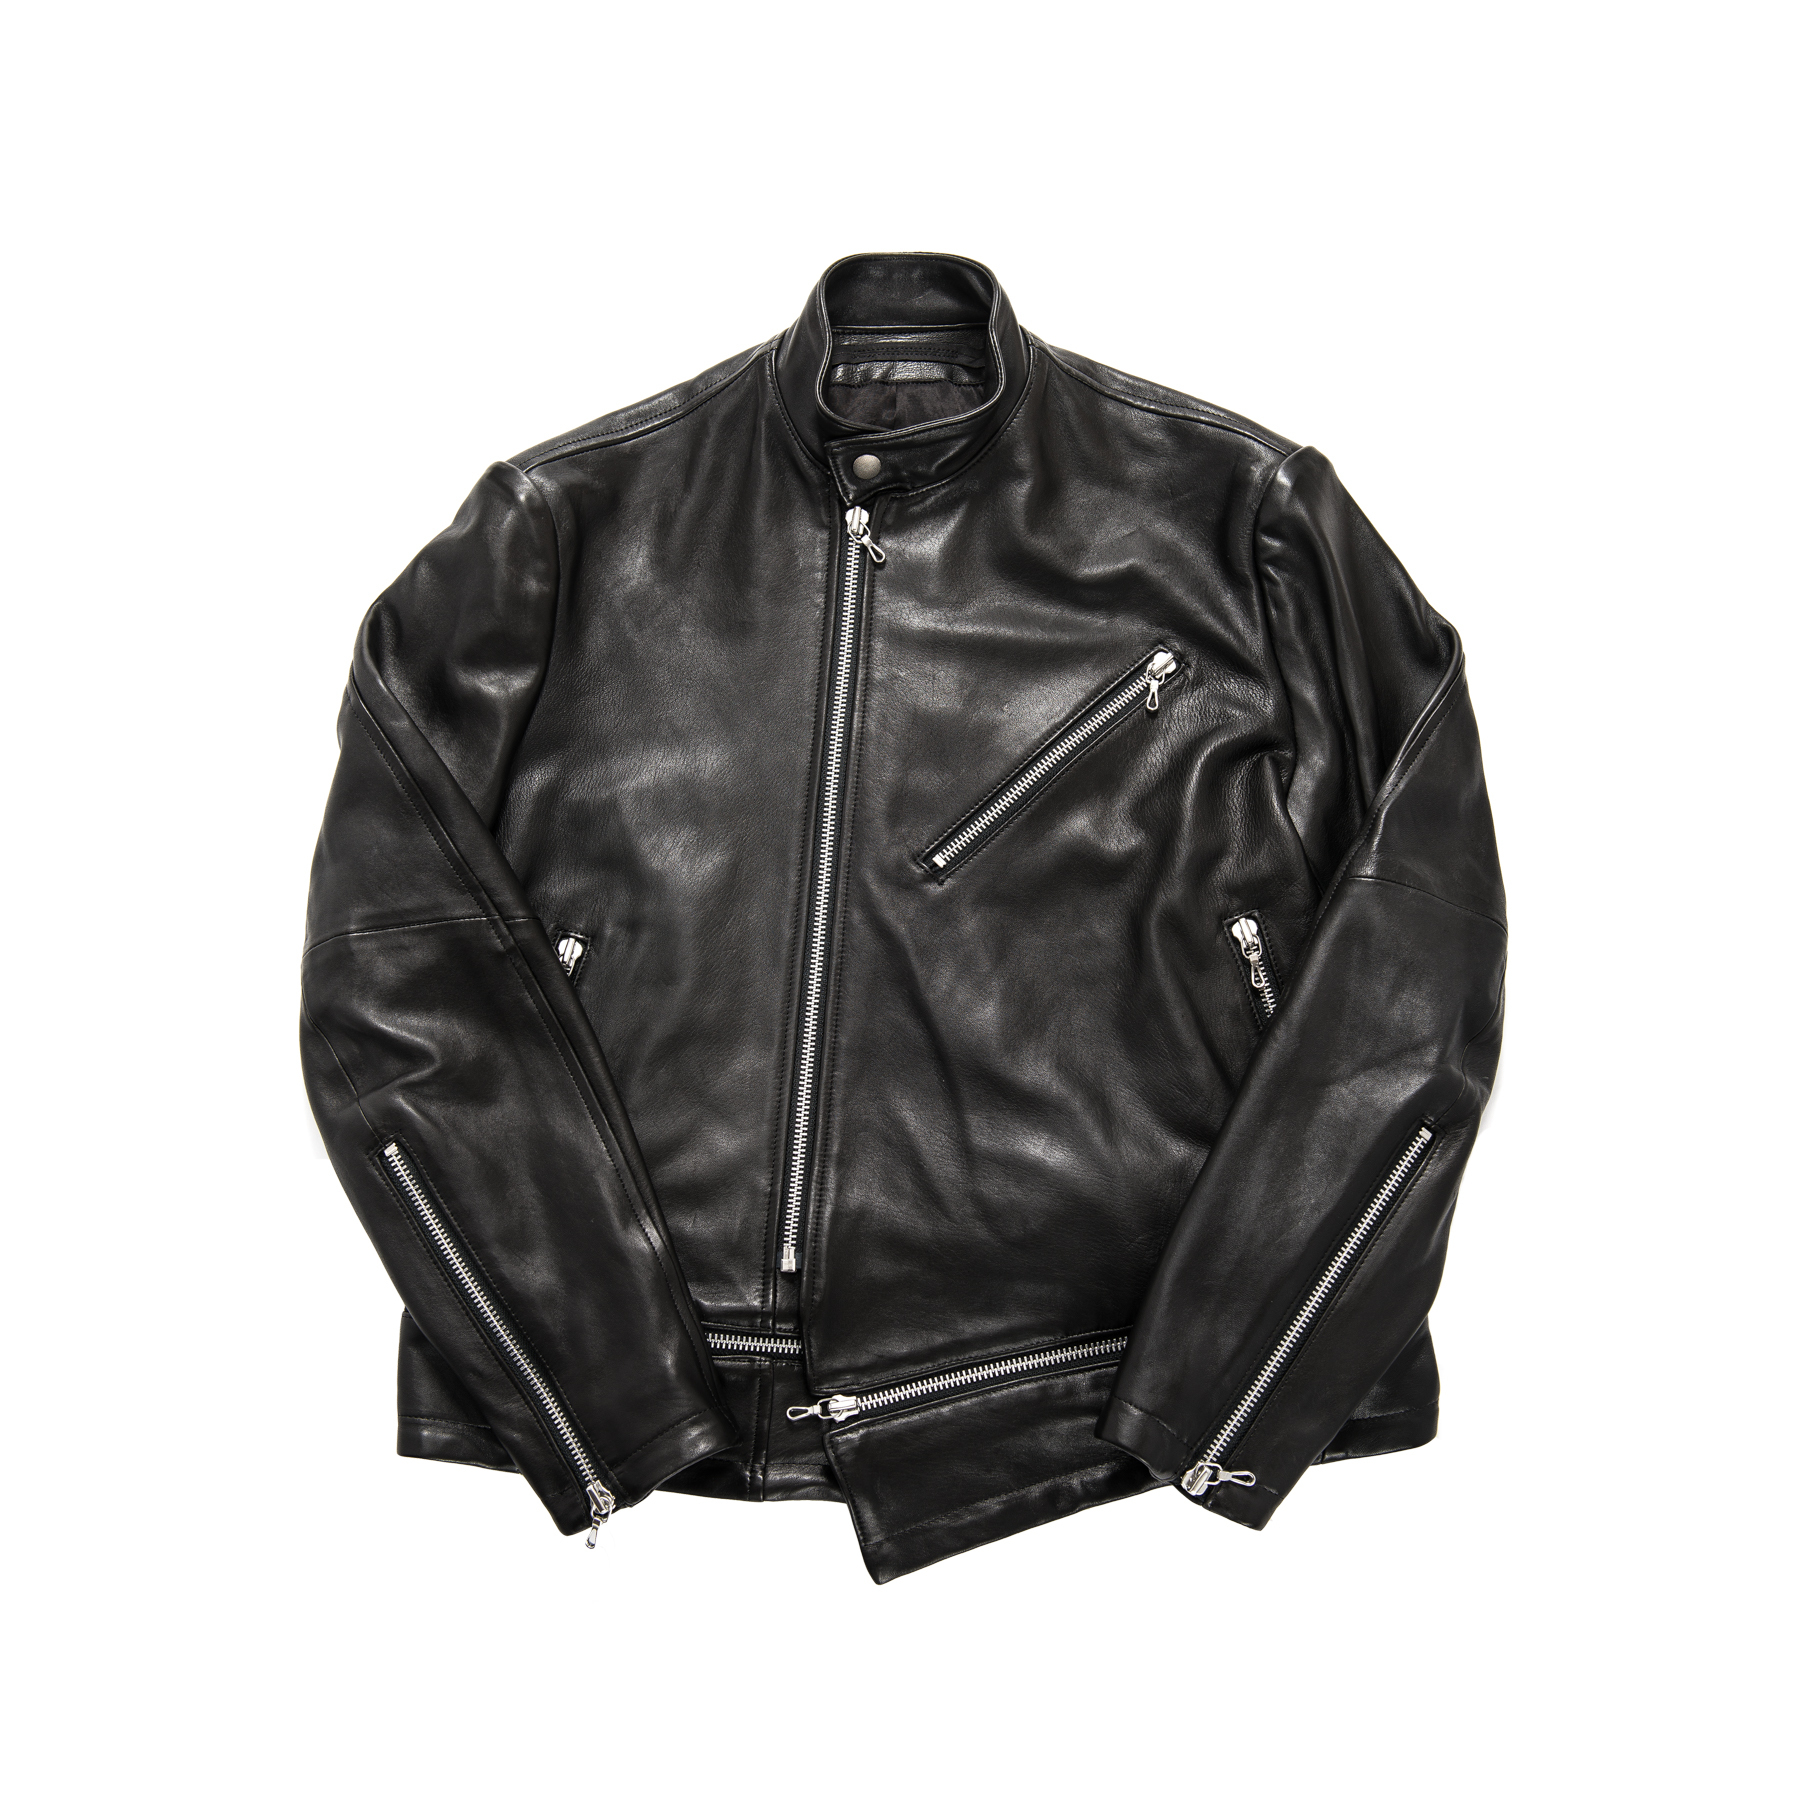 597BLM13-BLACK / アタッチドライダースジャケット